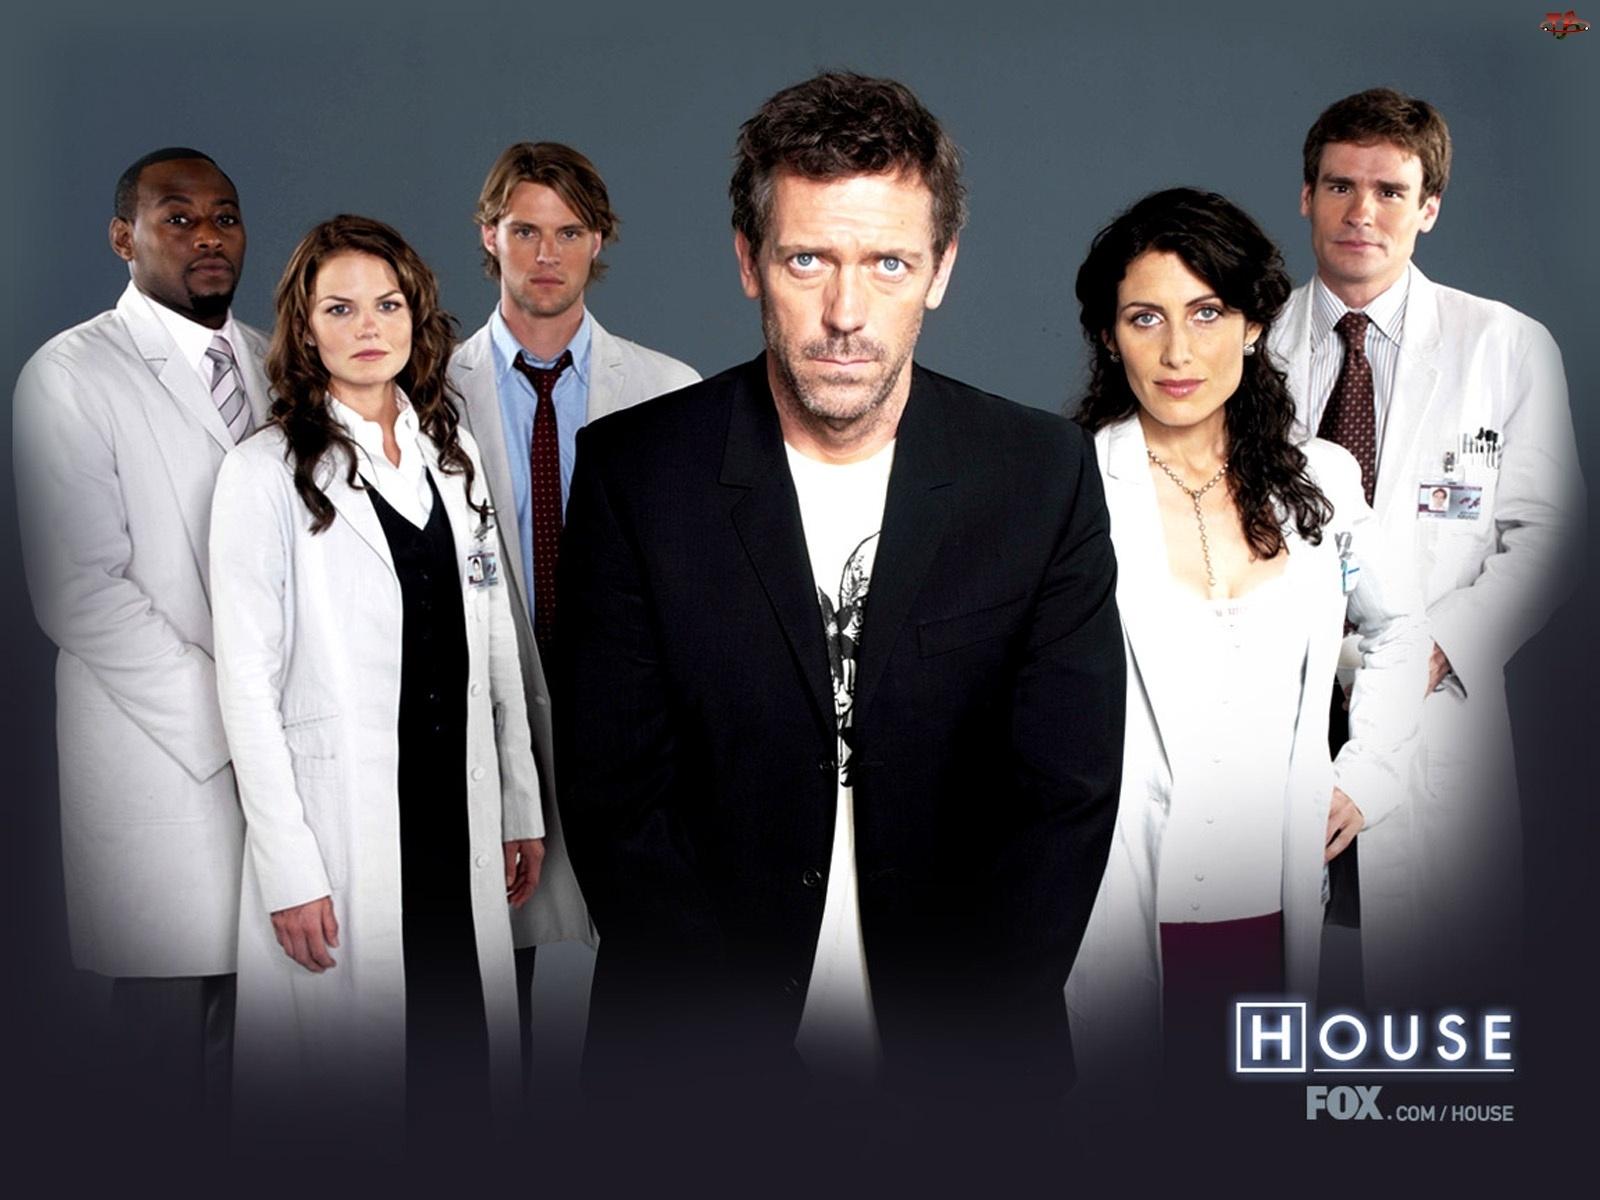 Dr. House, Lekarze